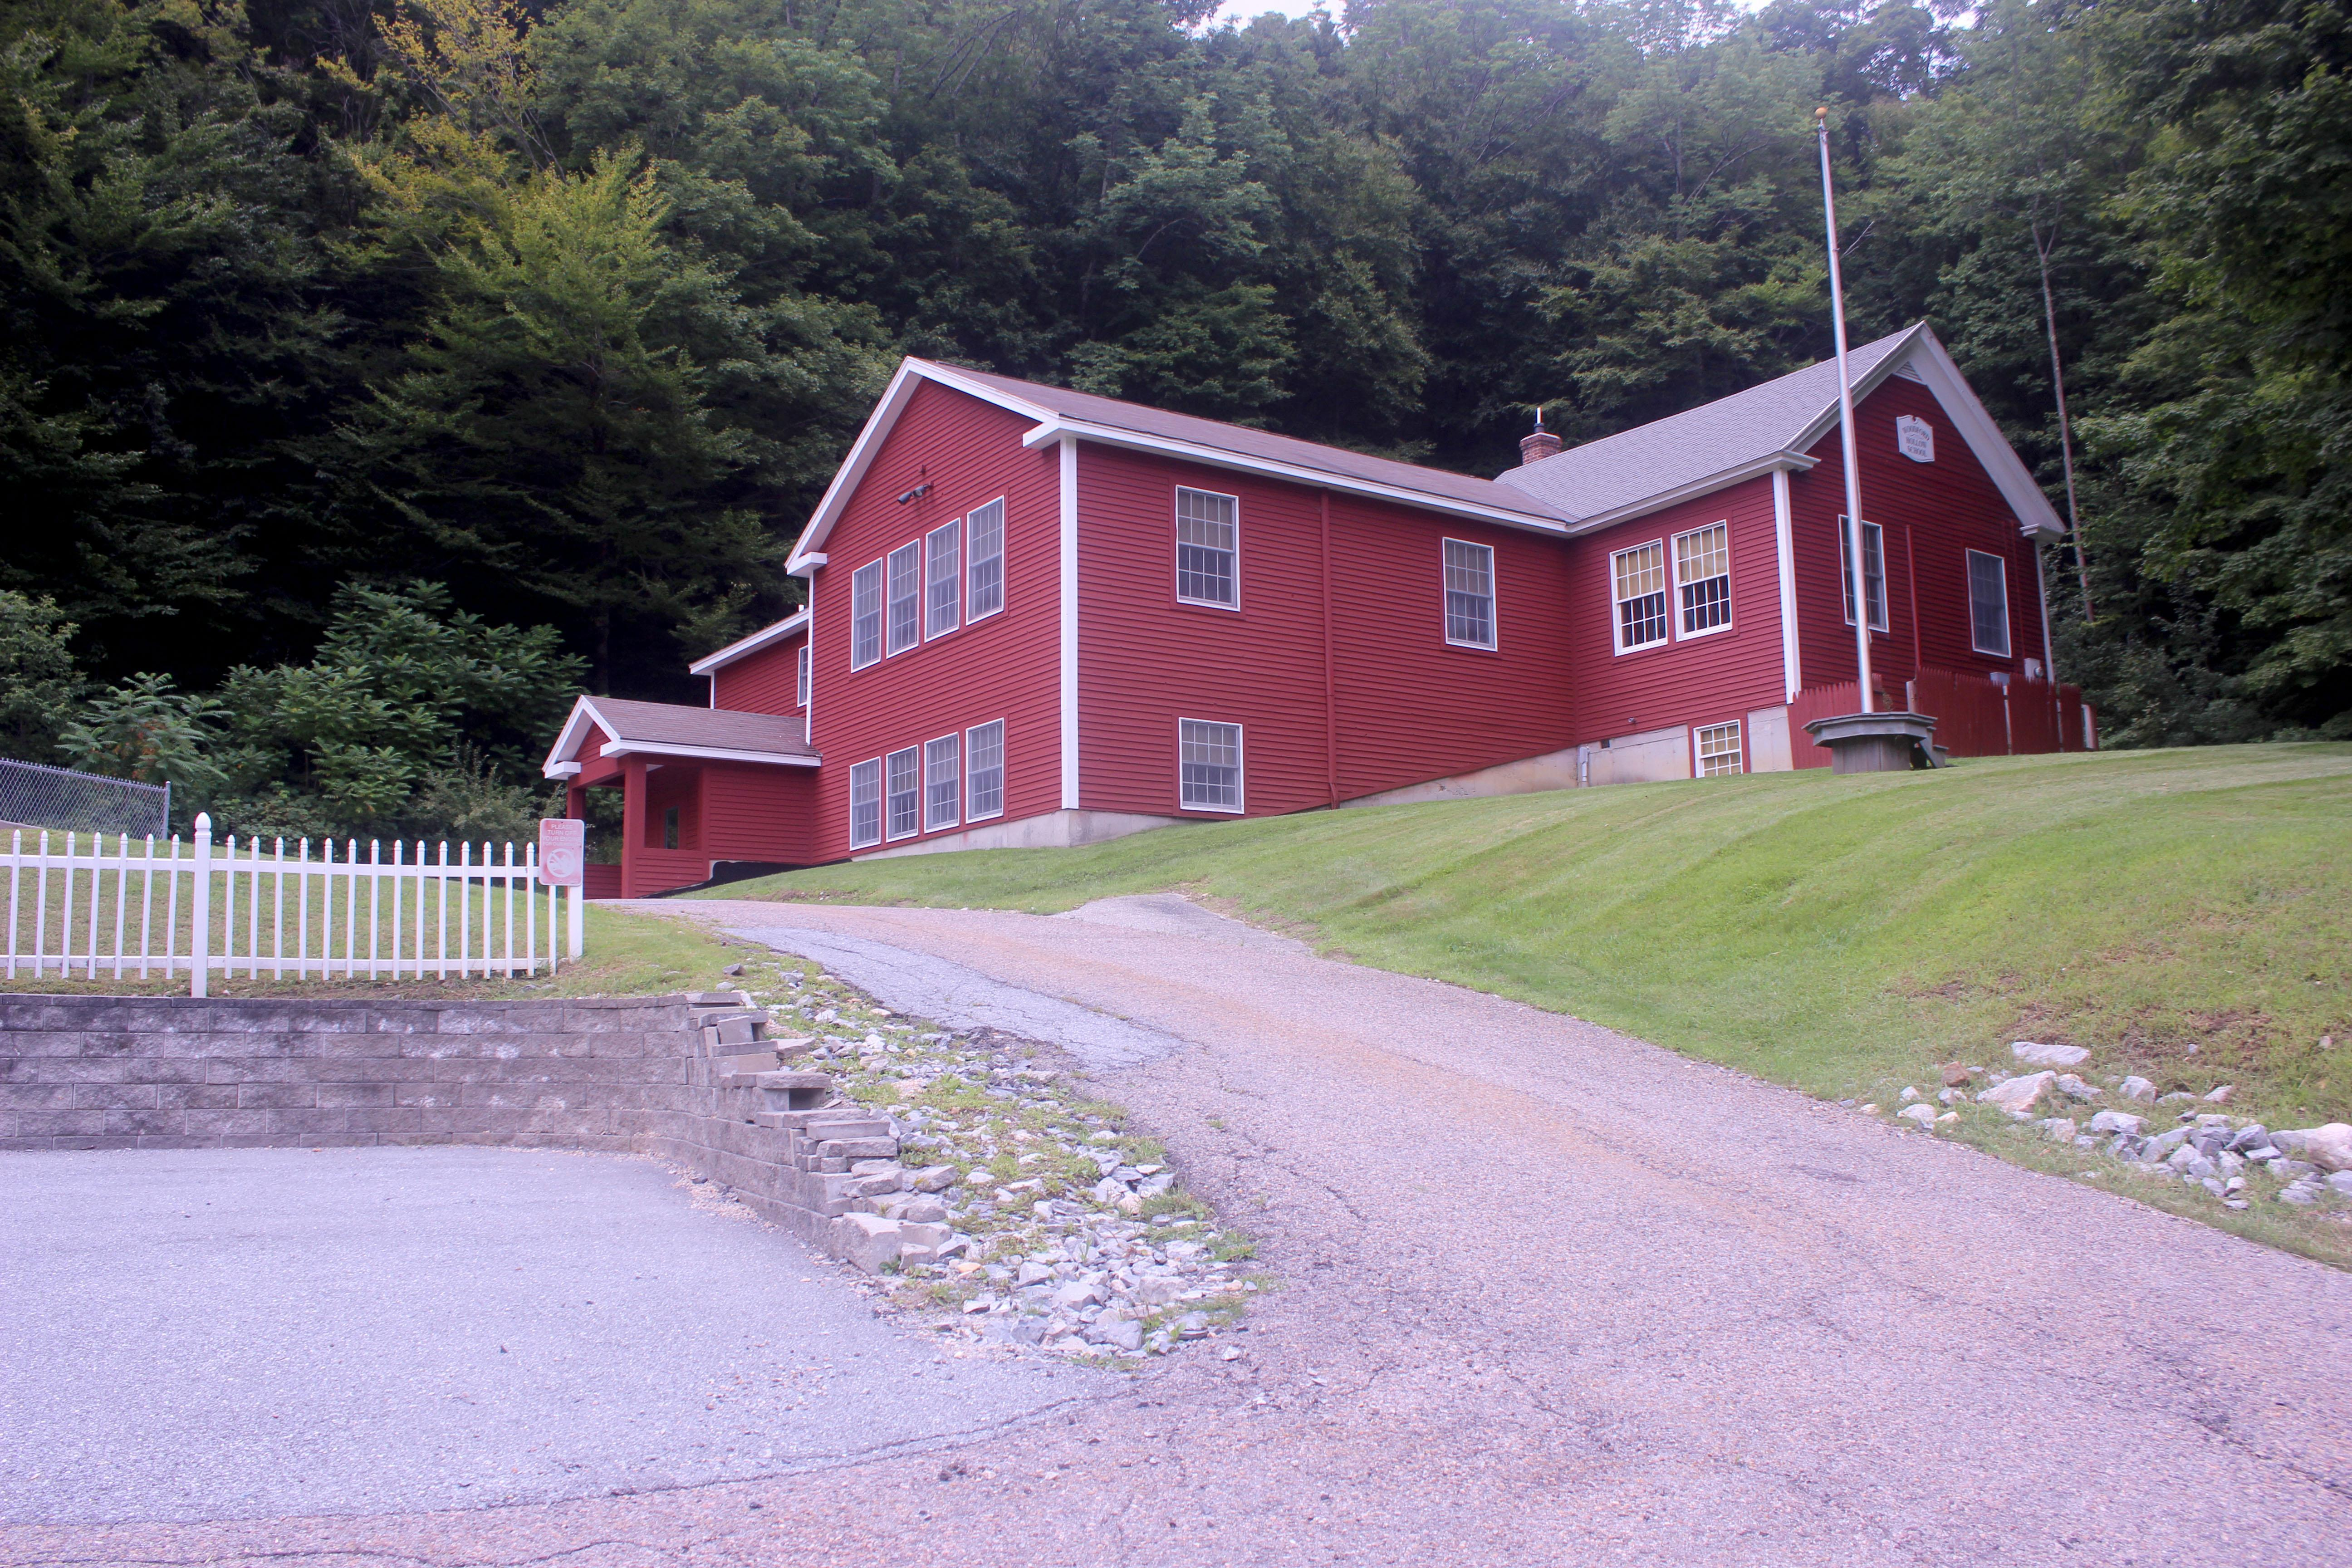 Shaftsbury Elementary school